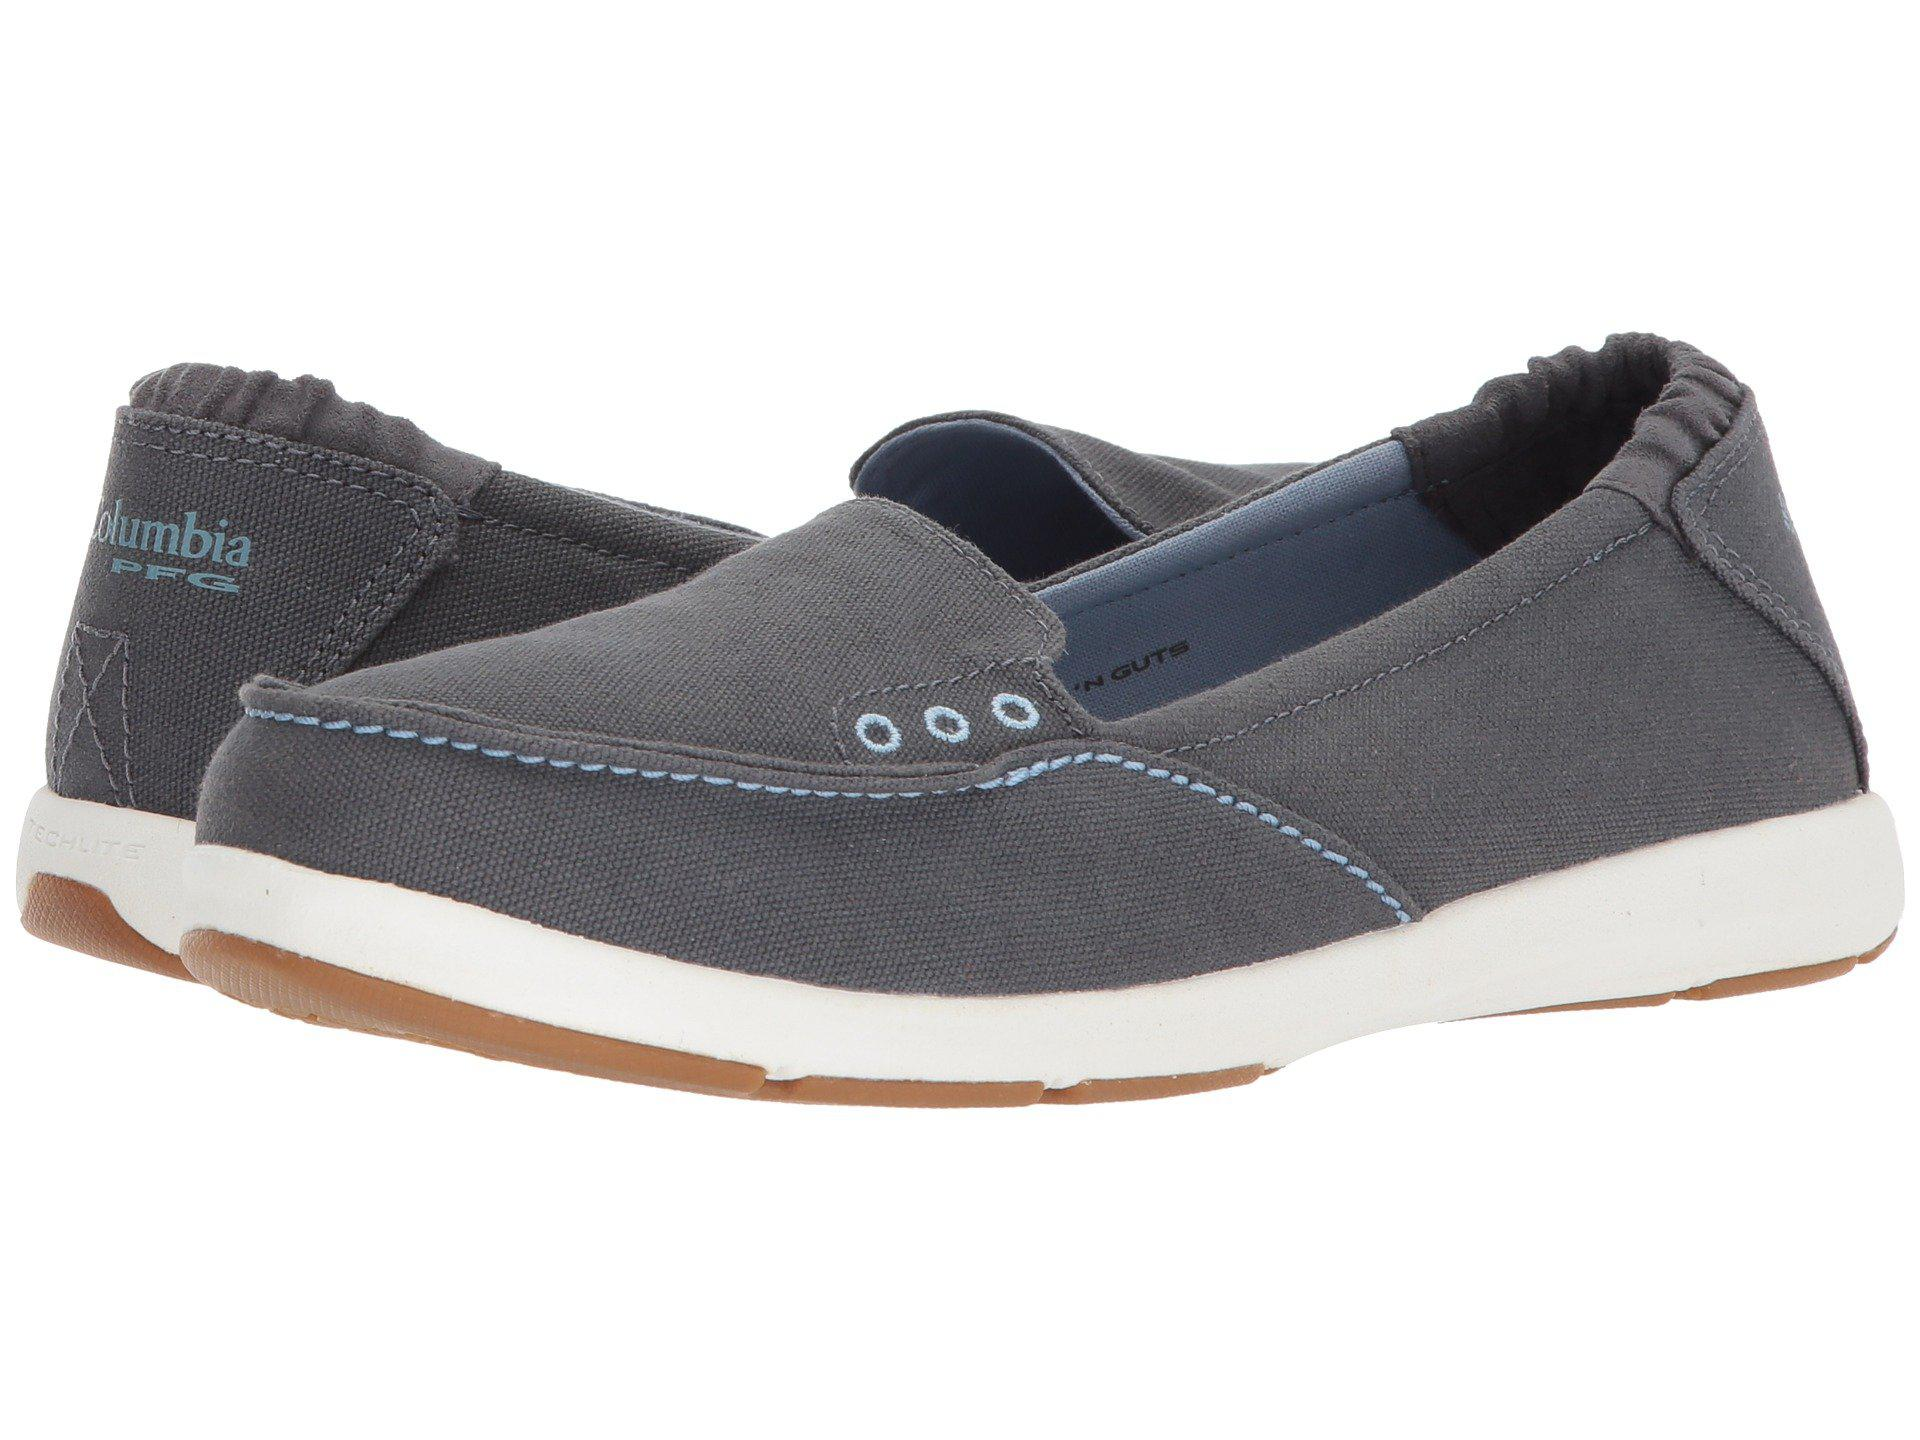 Lyst Columbia Delray Slip Pfg Graphite Dark Mirage Women S Shoes